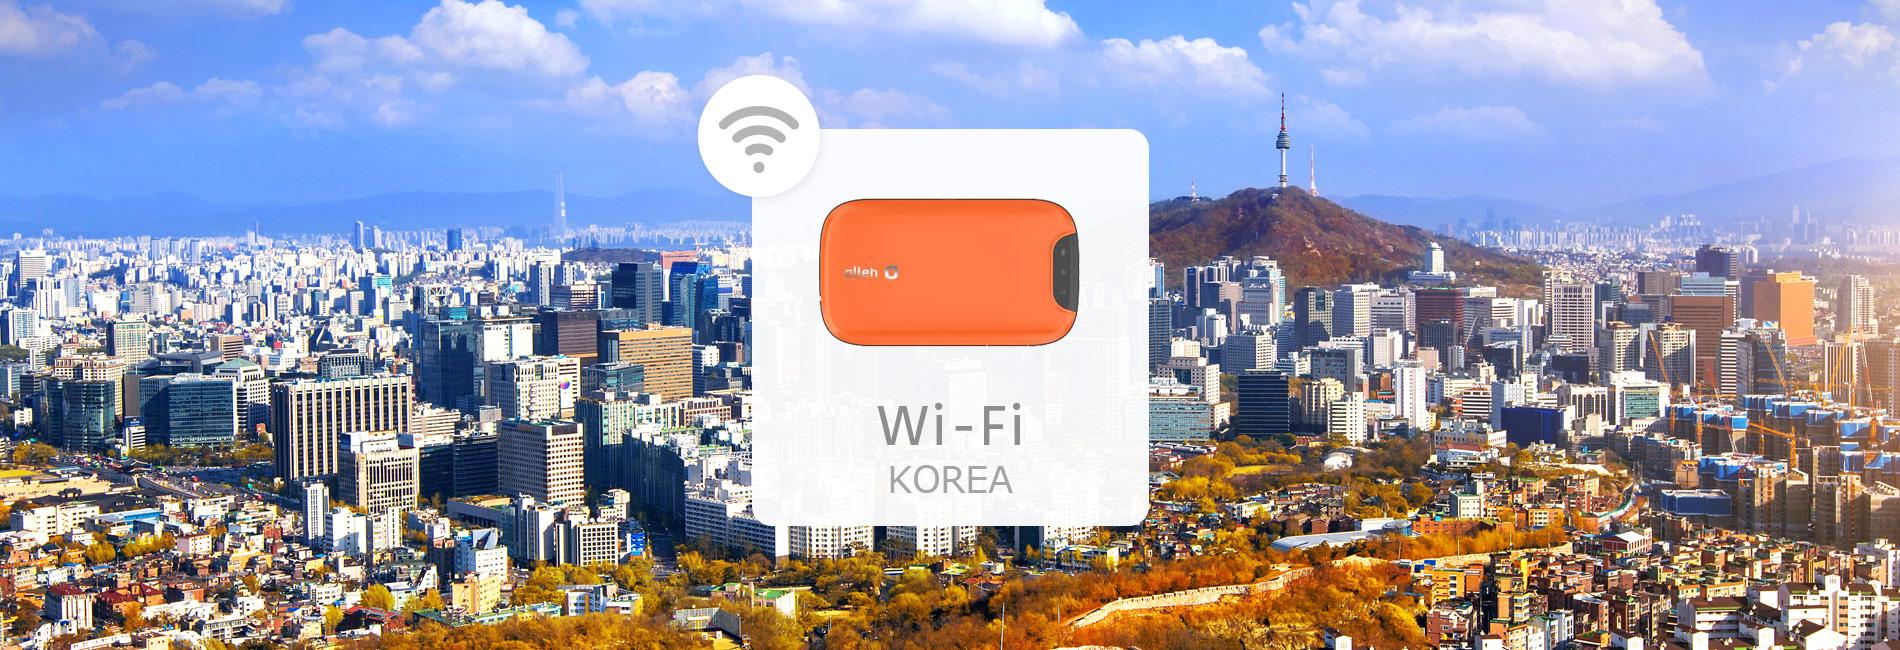 South Korea Unlimited 4G Portable Wi-Fi Rental (Pick-Up at Korea Airports)